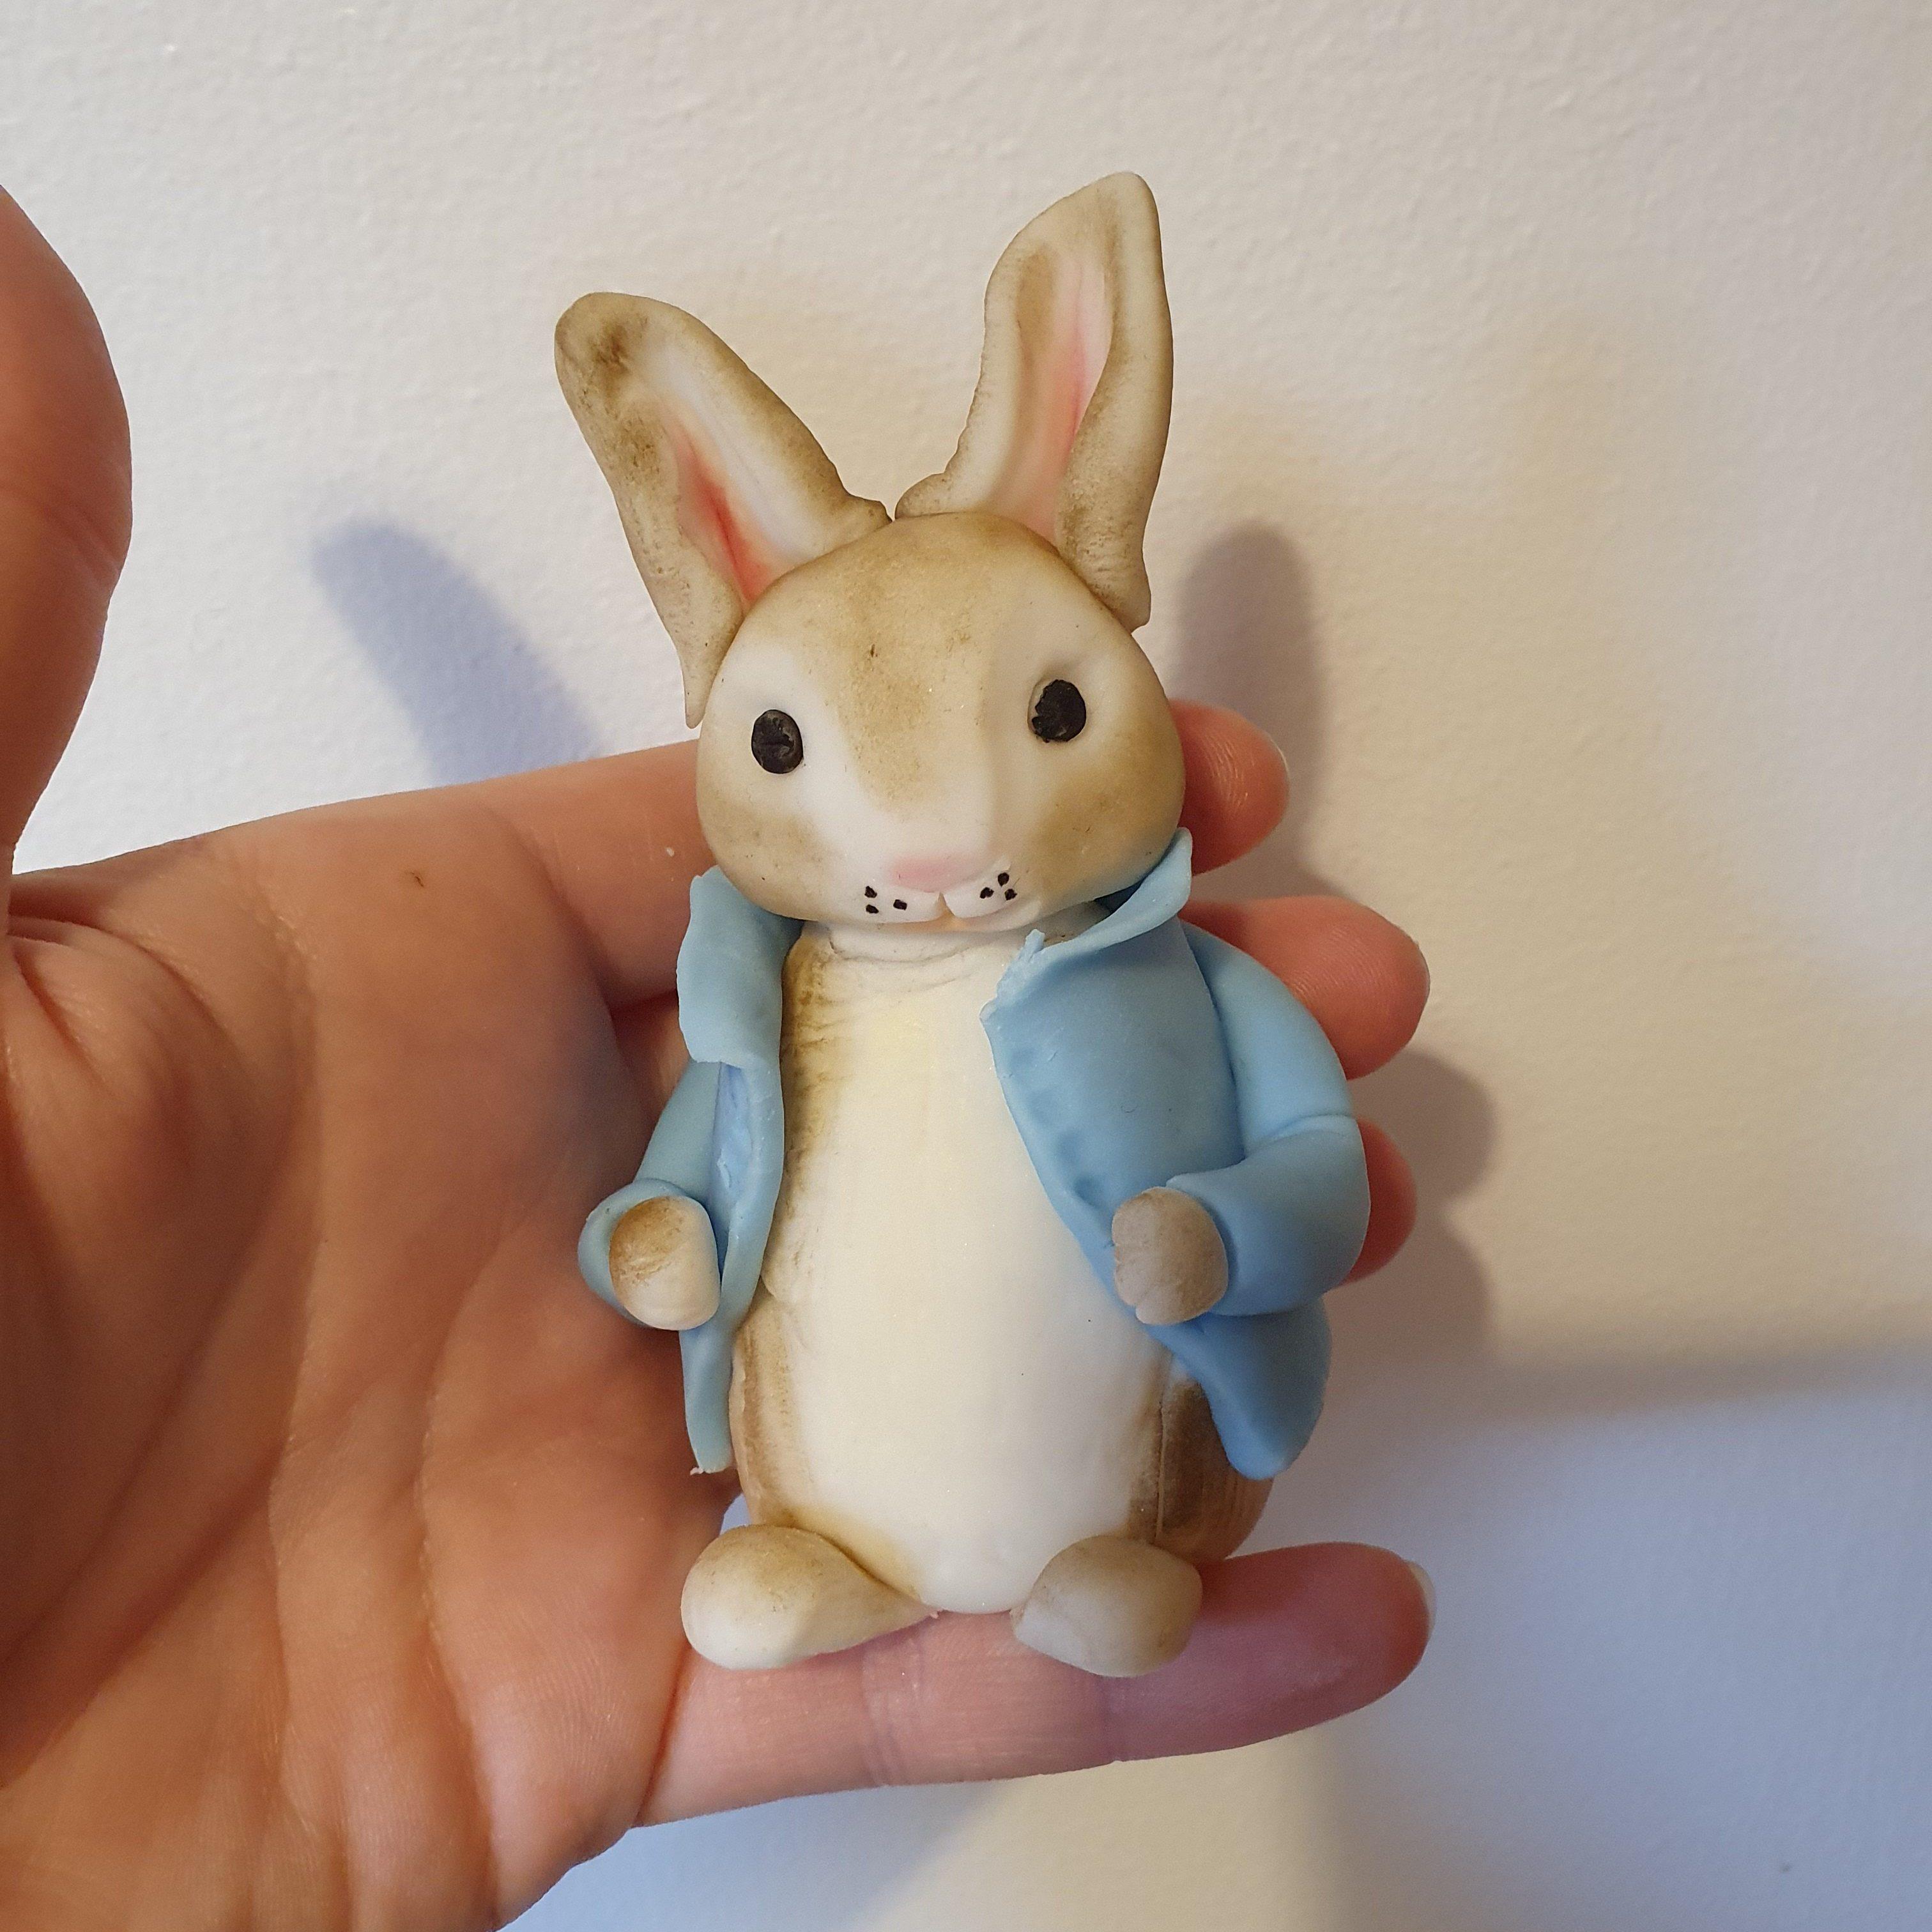 Creating bespoke cakes Peter Rabbit cake topper